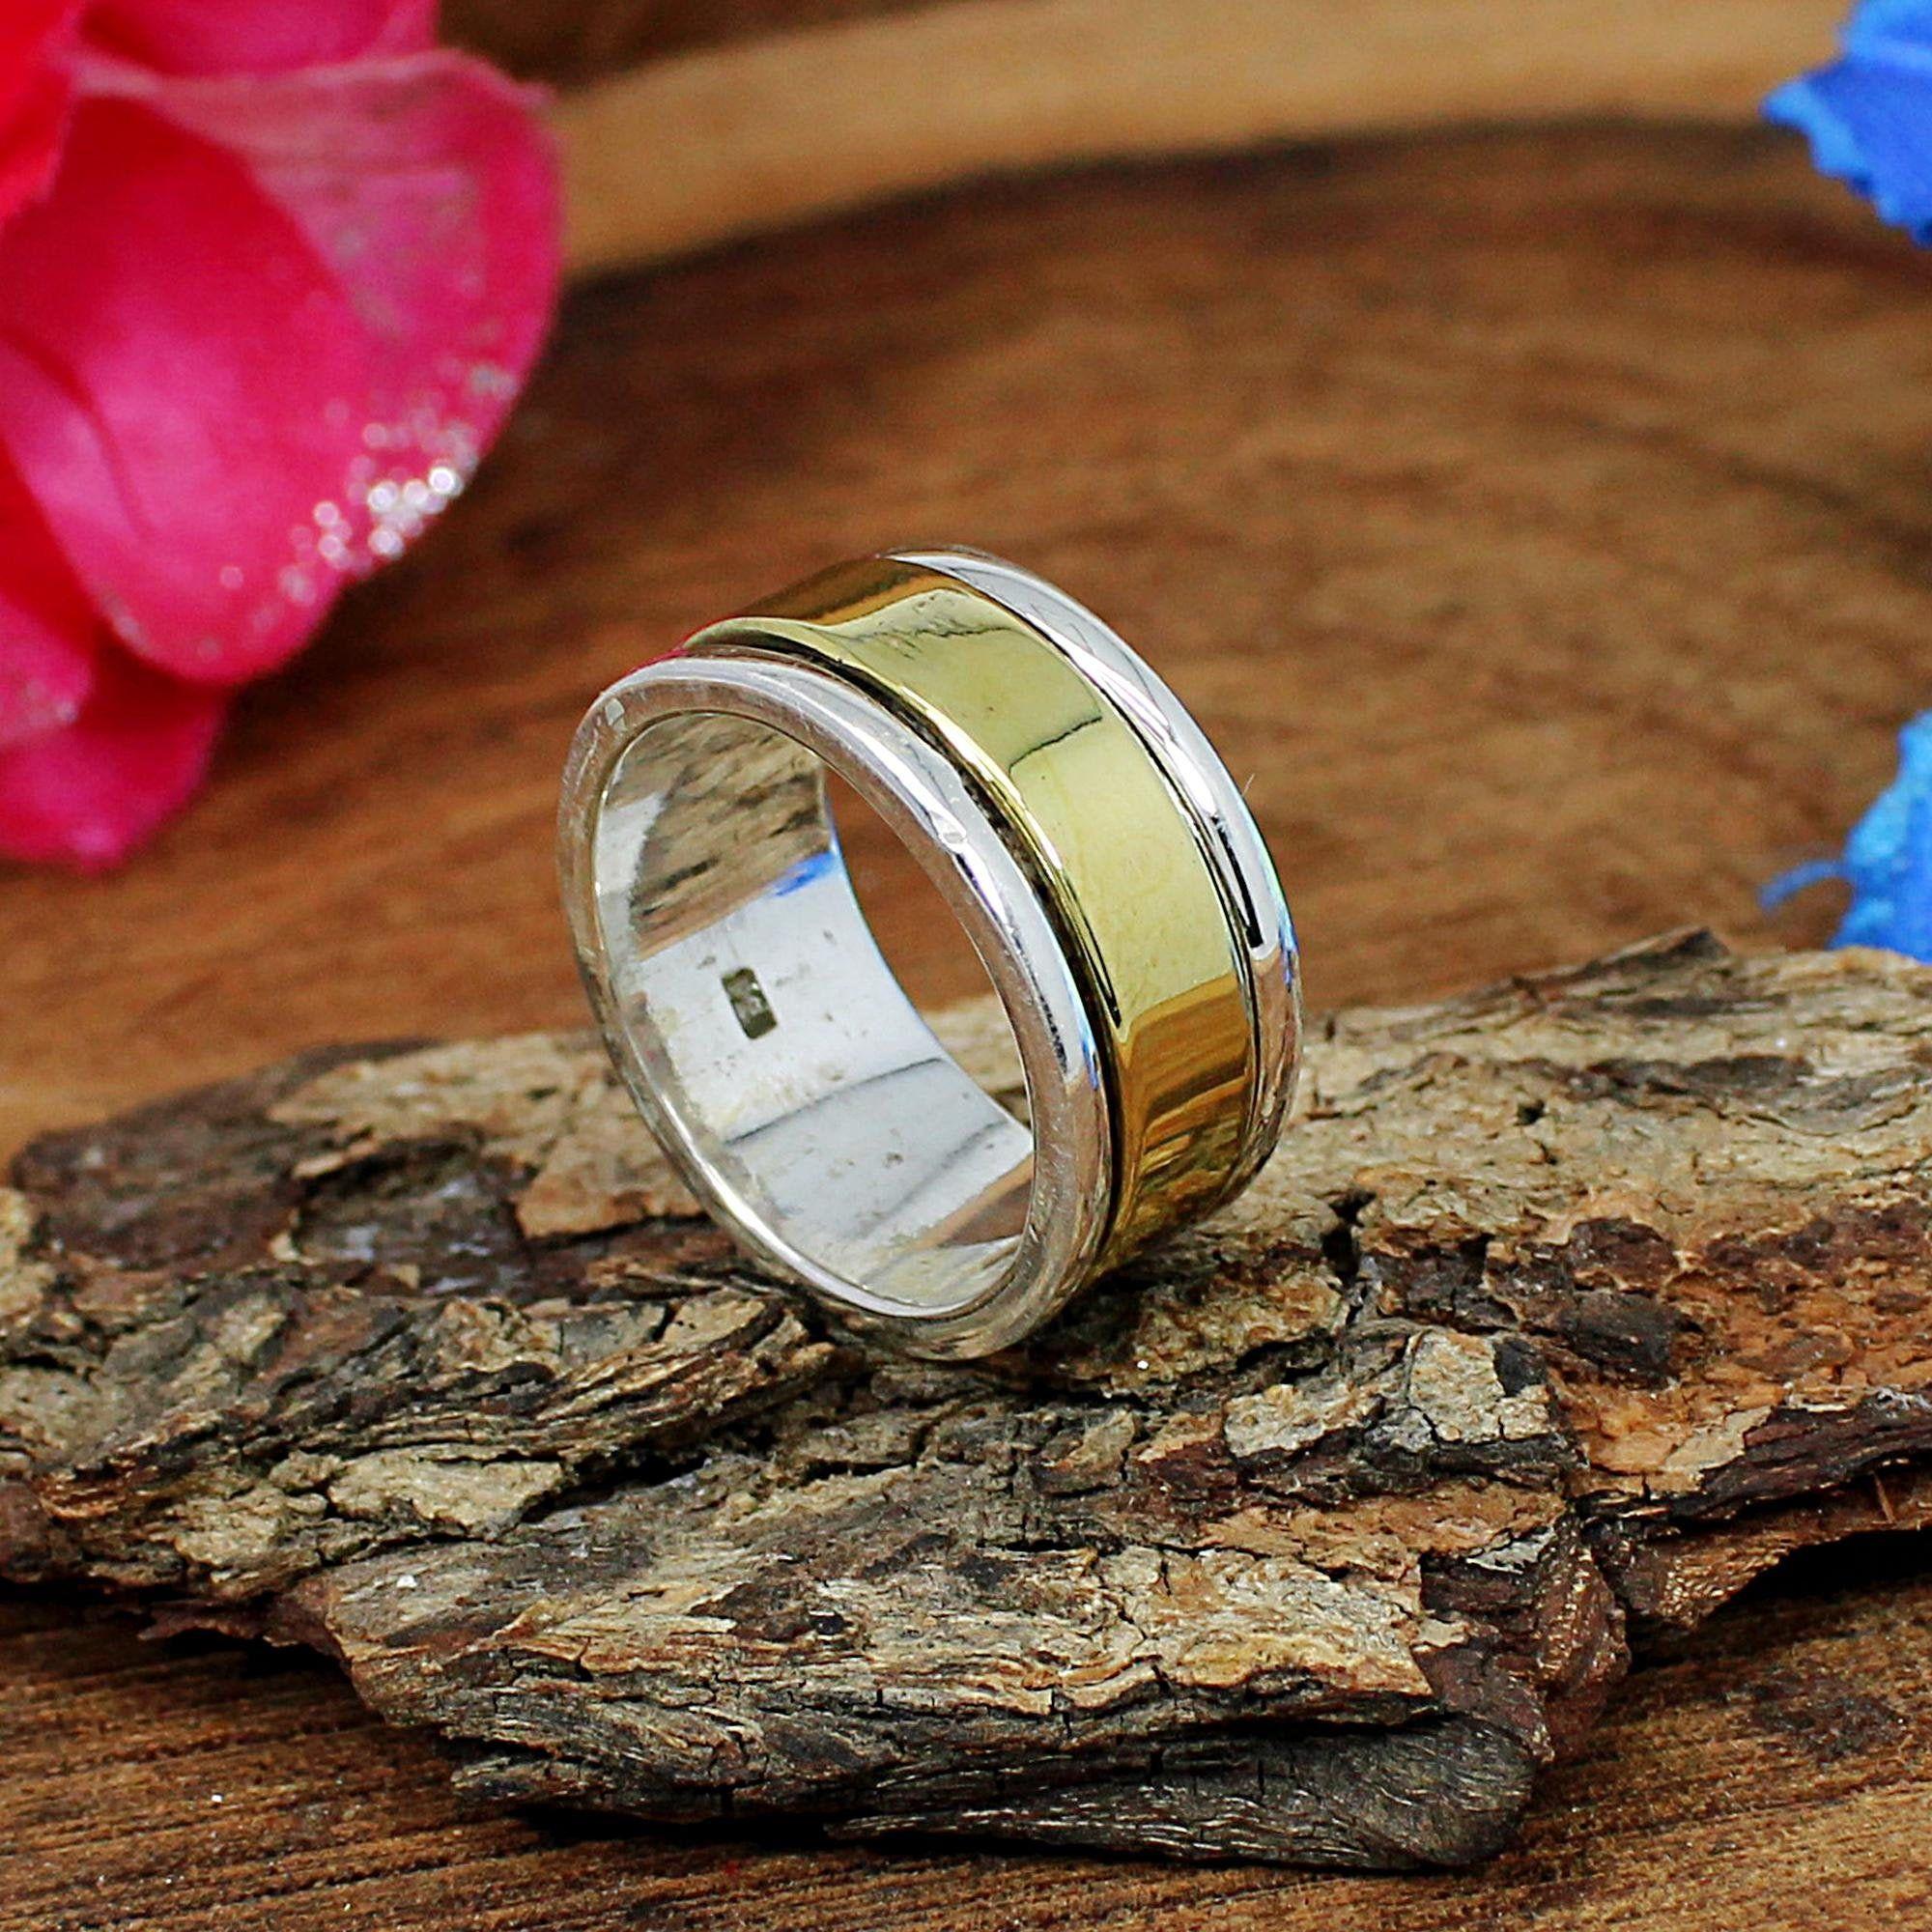 925 silver ring challa ring silver ring plain ring handmade ring simple ring sterling ring ring men like ring